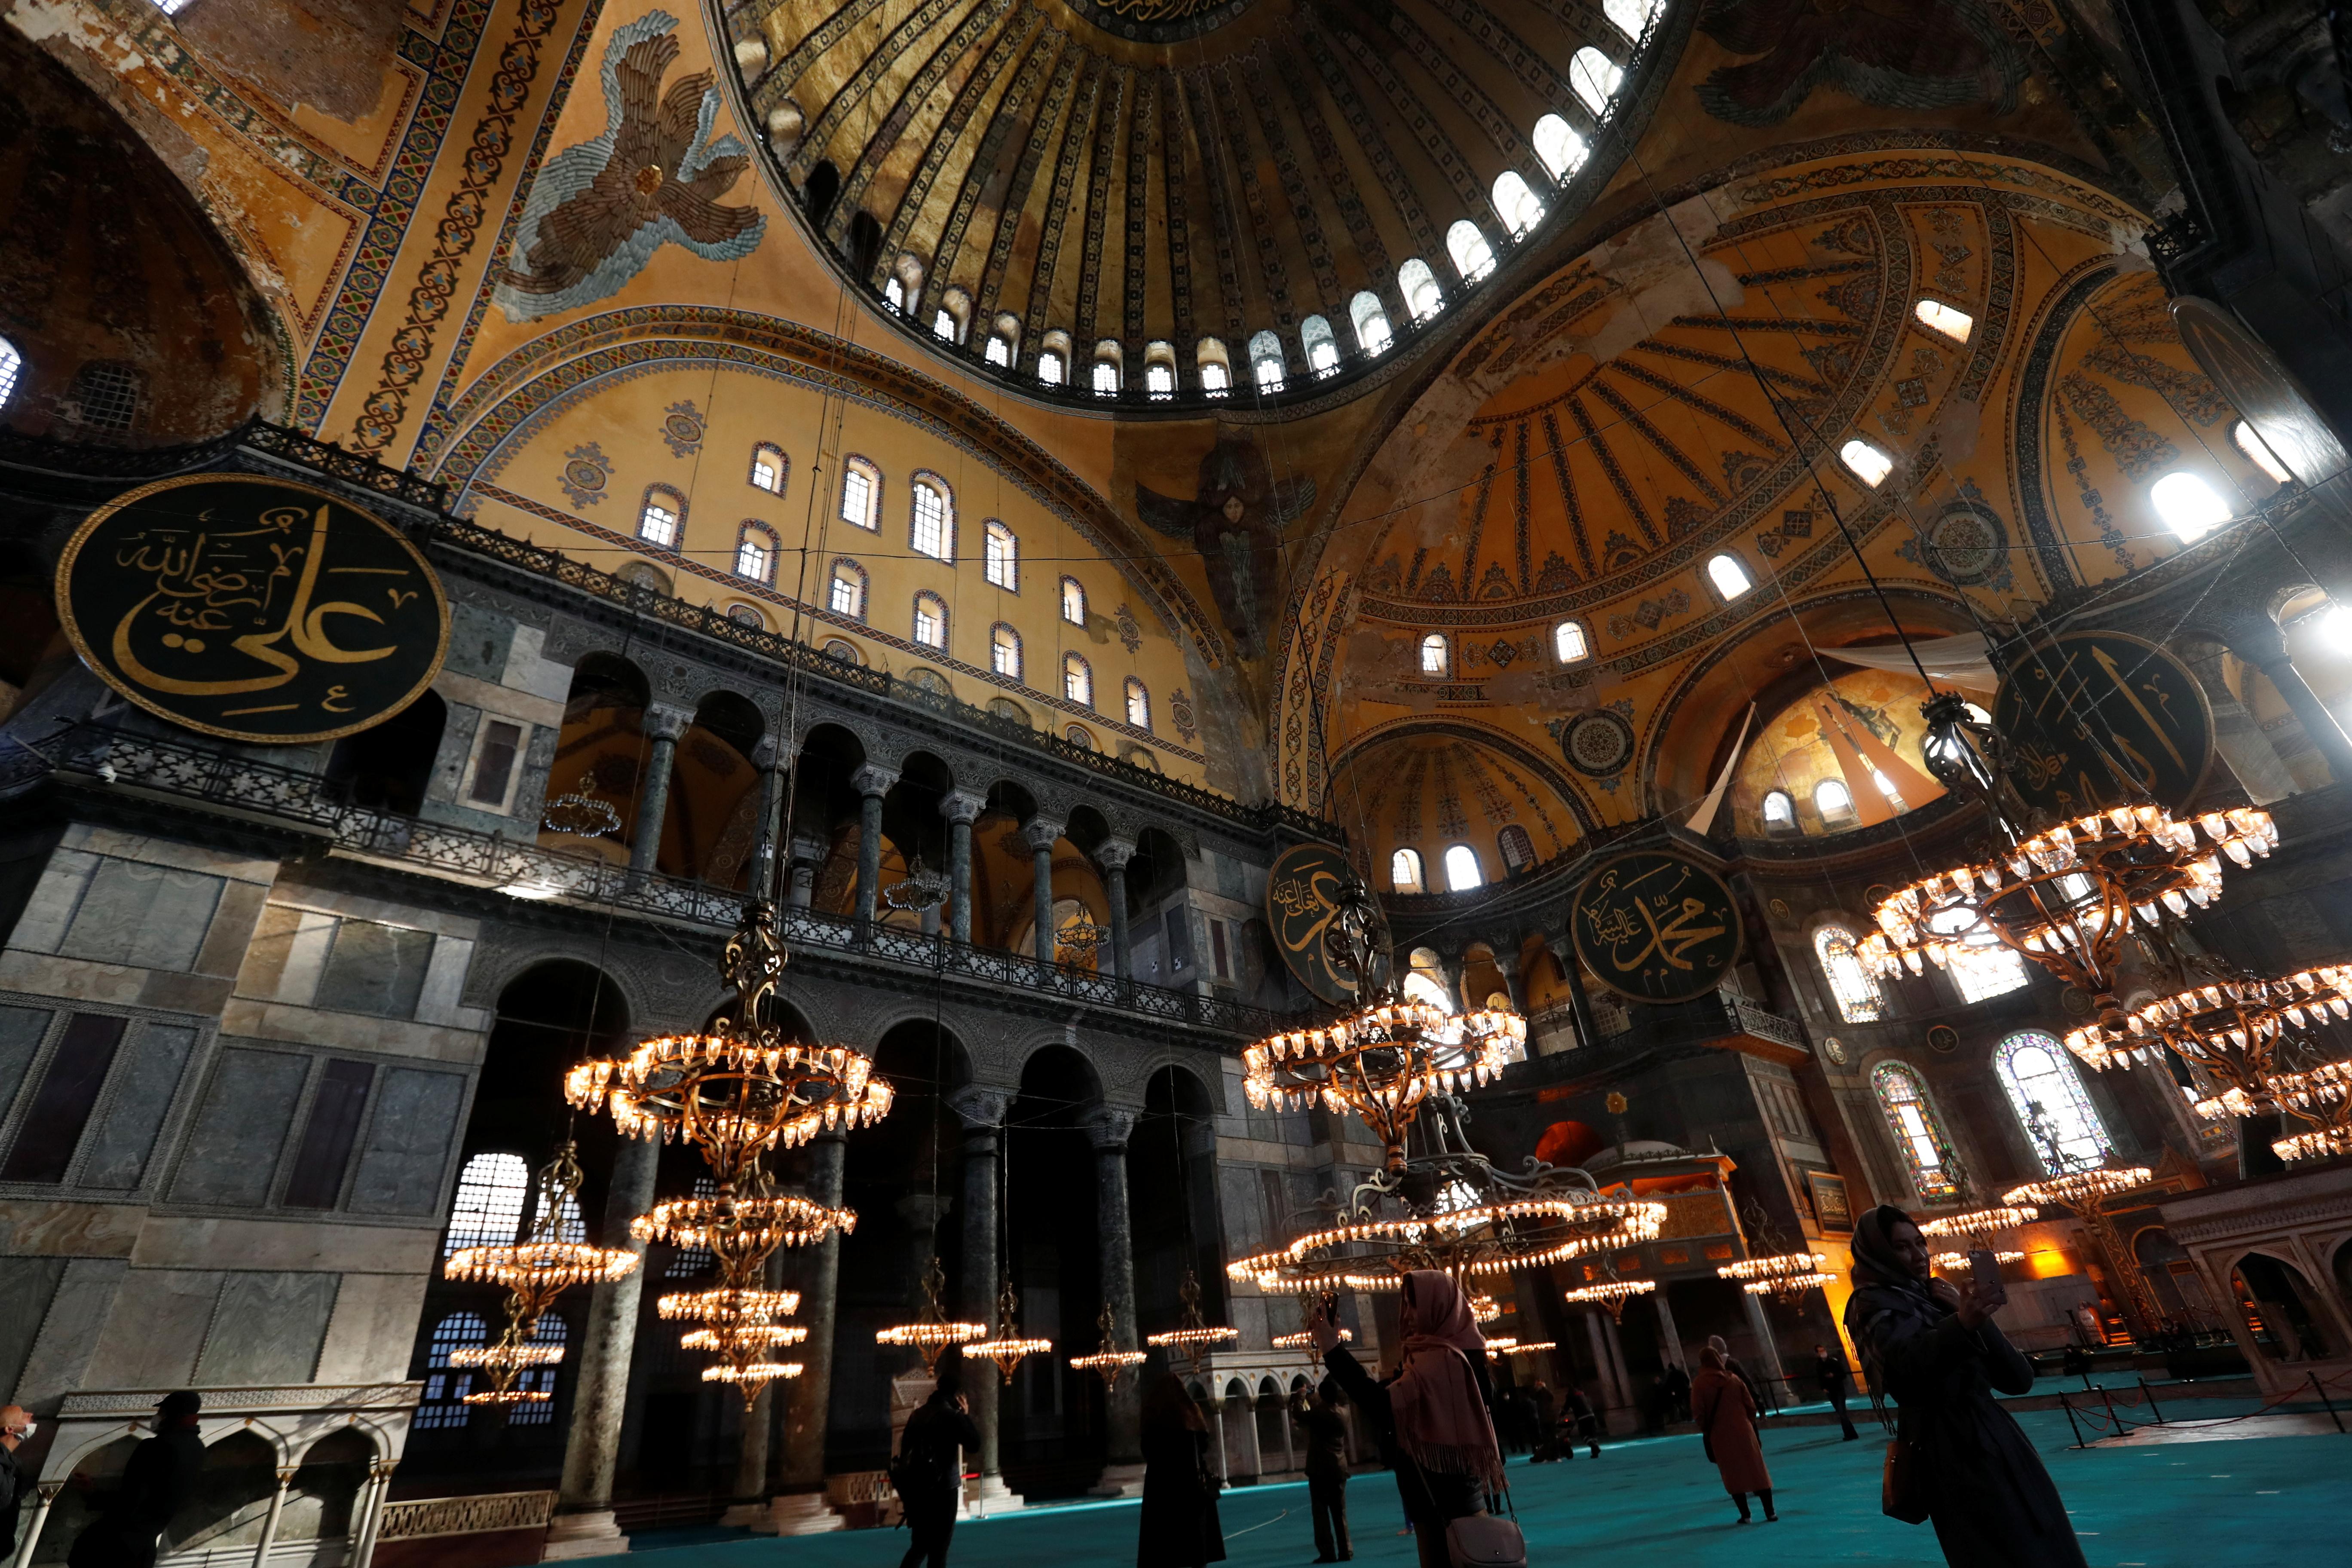 Local and foreign tourists visit Ayasofya-i Kebir Camii or Hagia Sophia Grand Mosque amid the coronavirus disease (COVID-19) outbreak in Istanbul, Turkey January 29, 2021. REUTERS/Murad Sezer